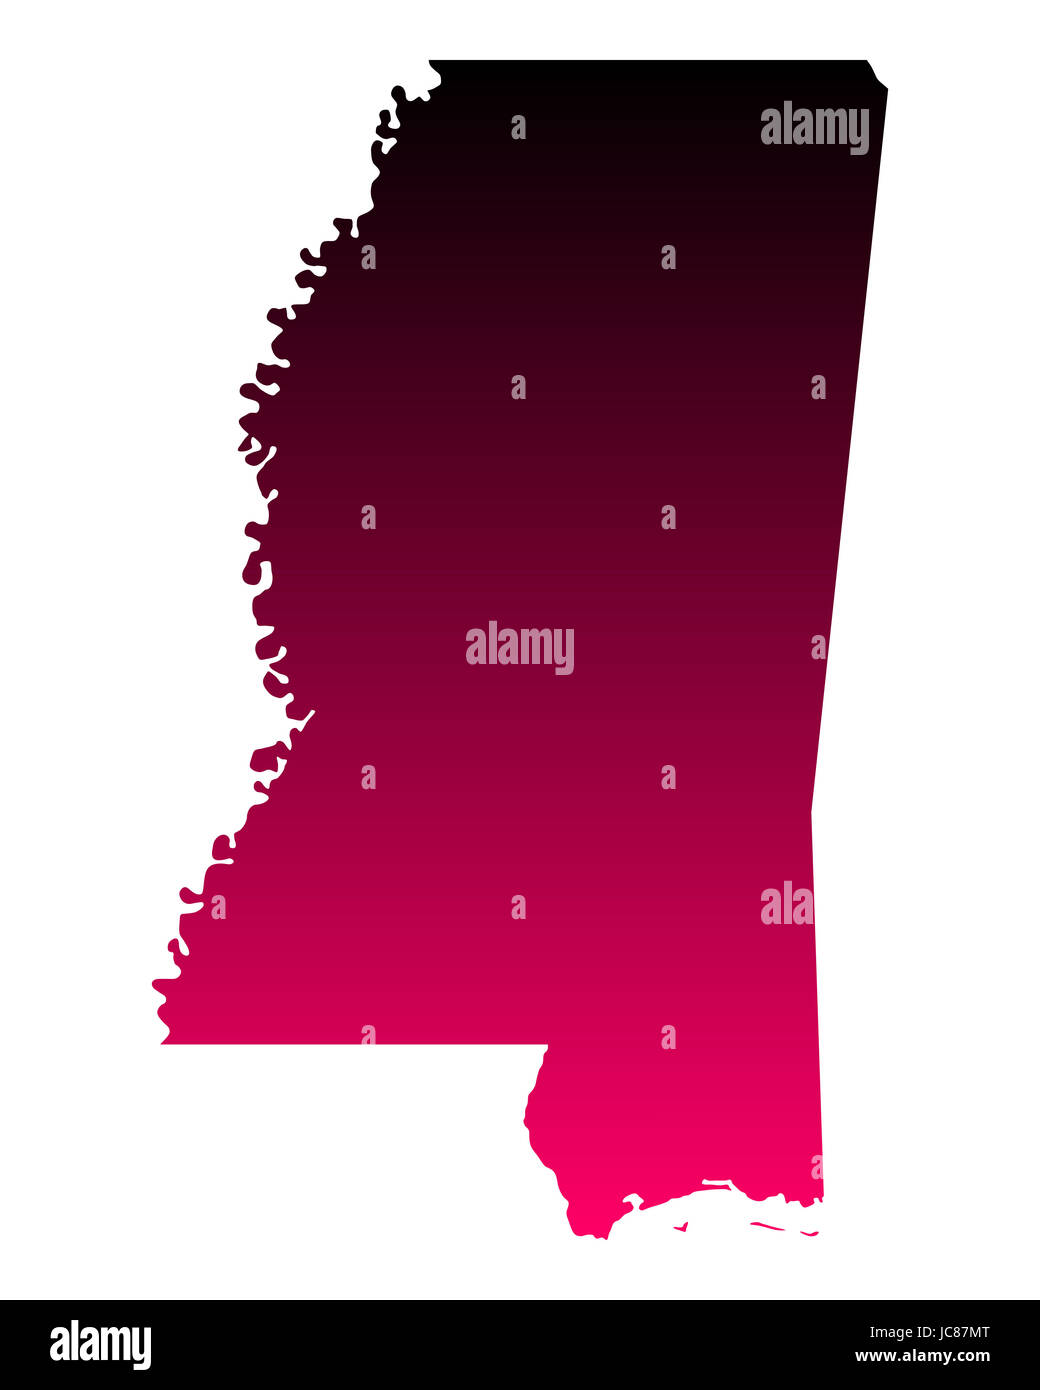 Karte von Mississippi - Stock Image